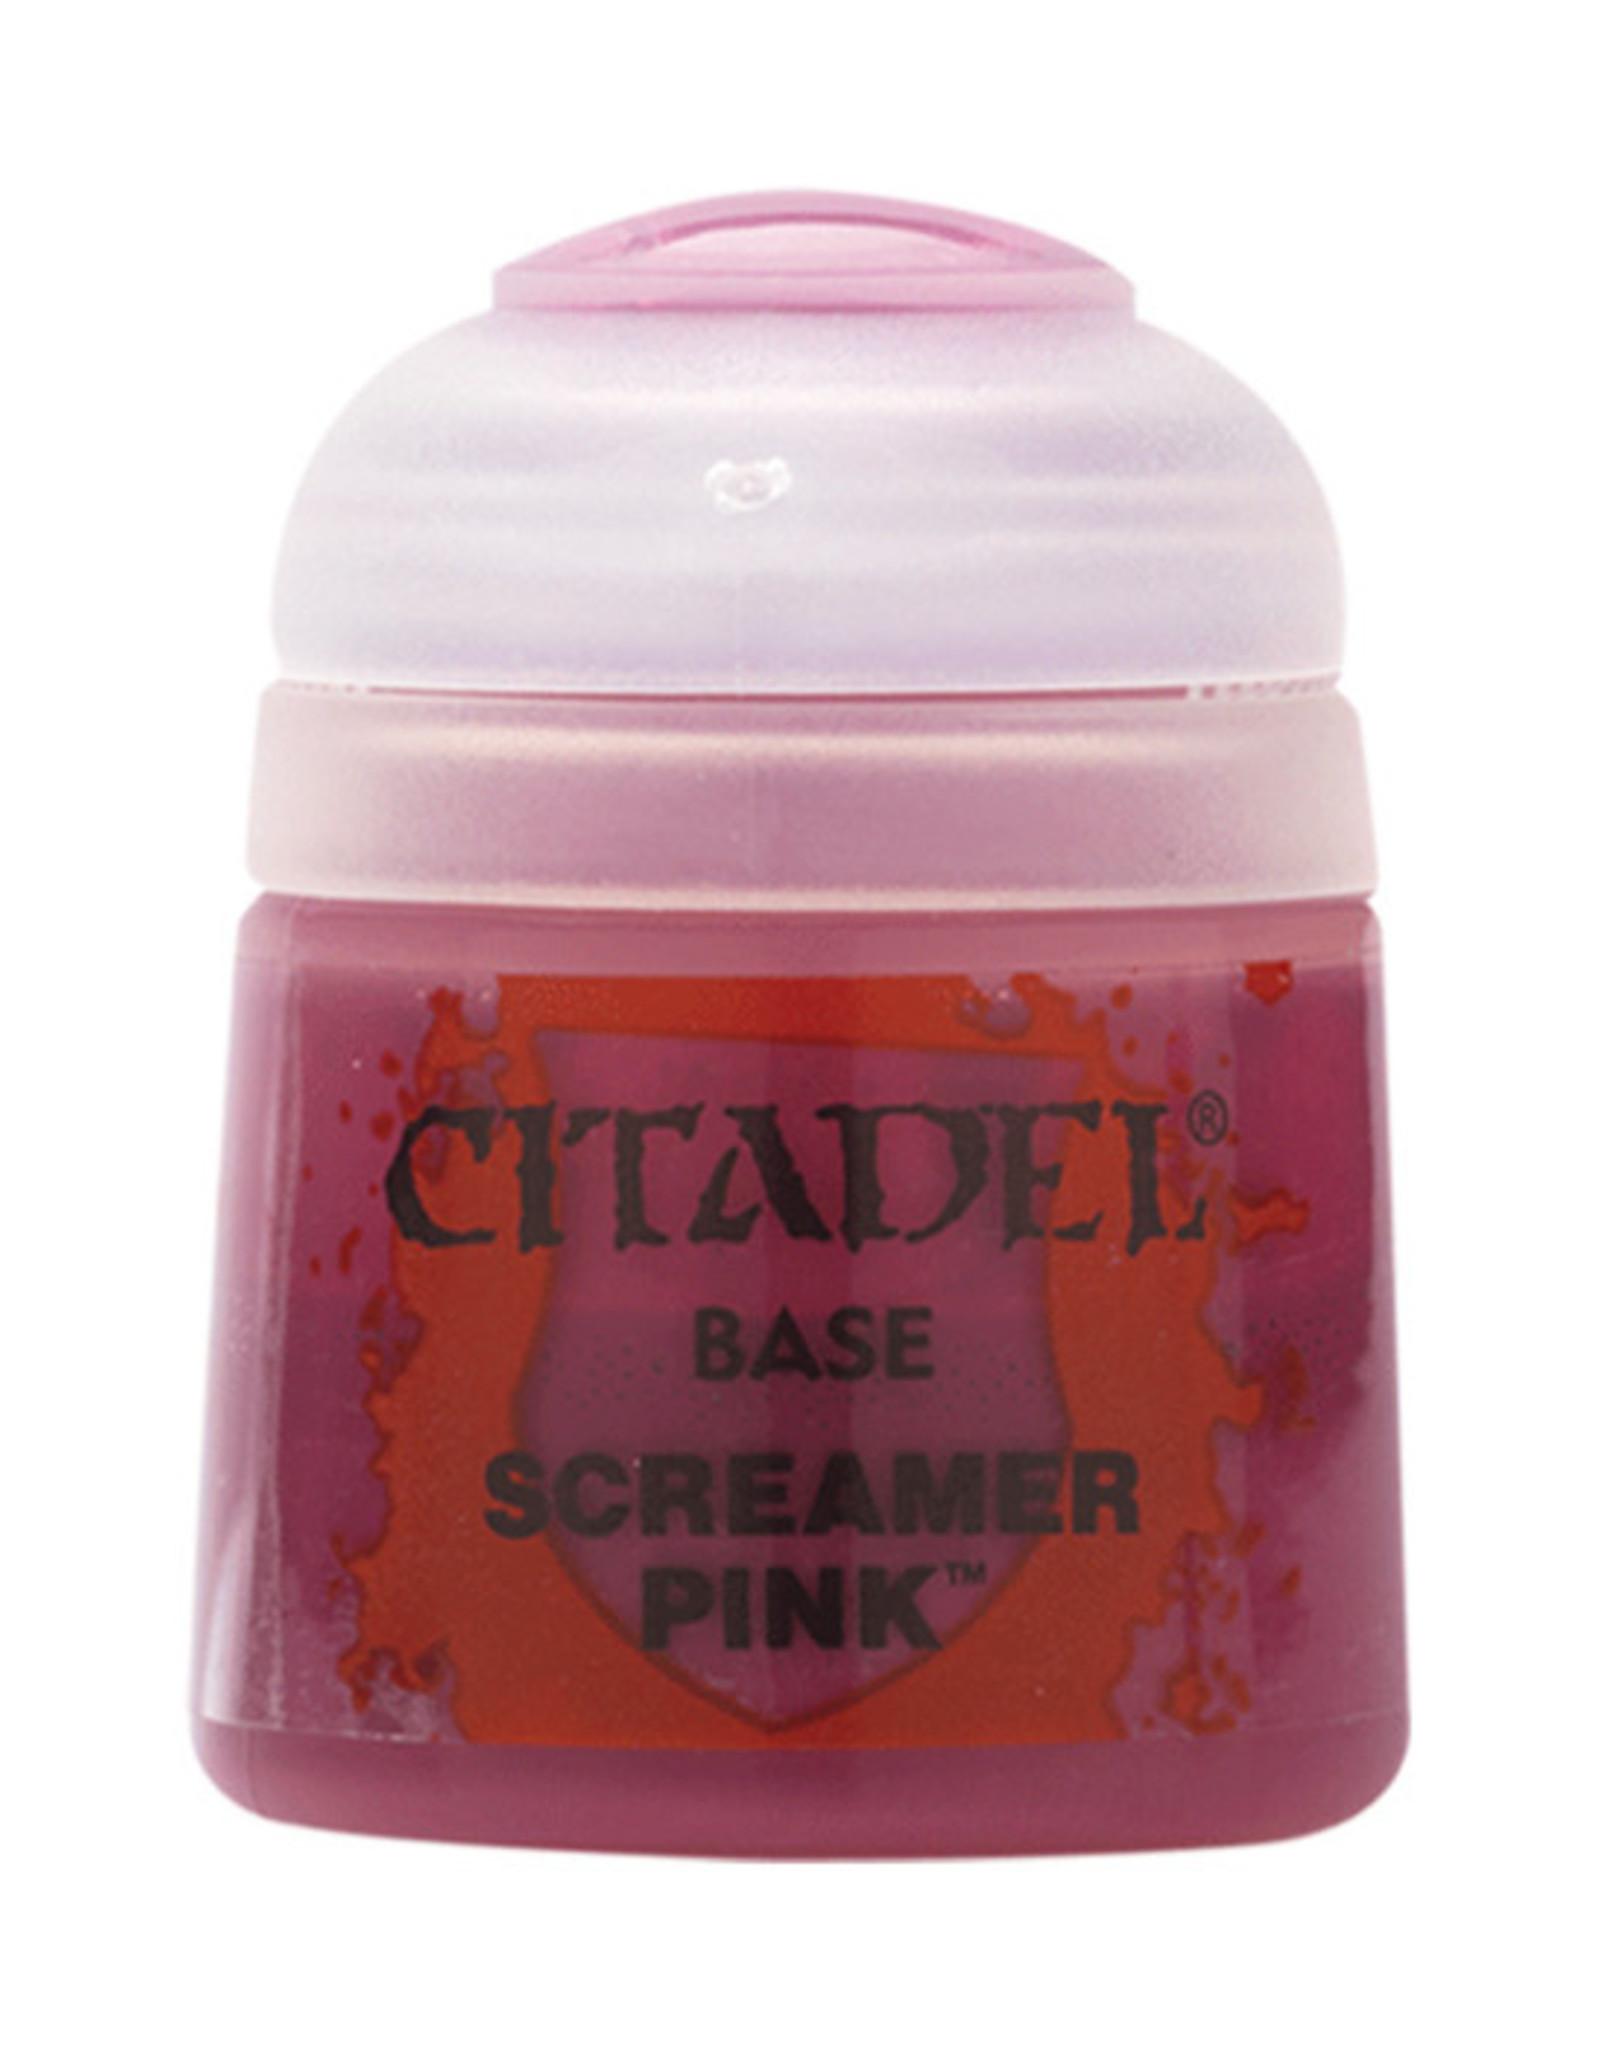 Citadel Citadel Colour: Base - Screamer Pink